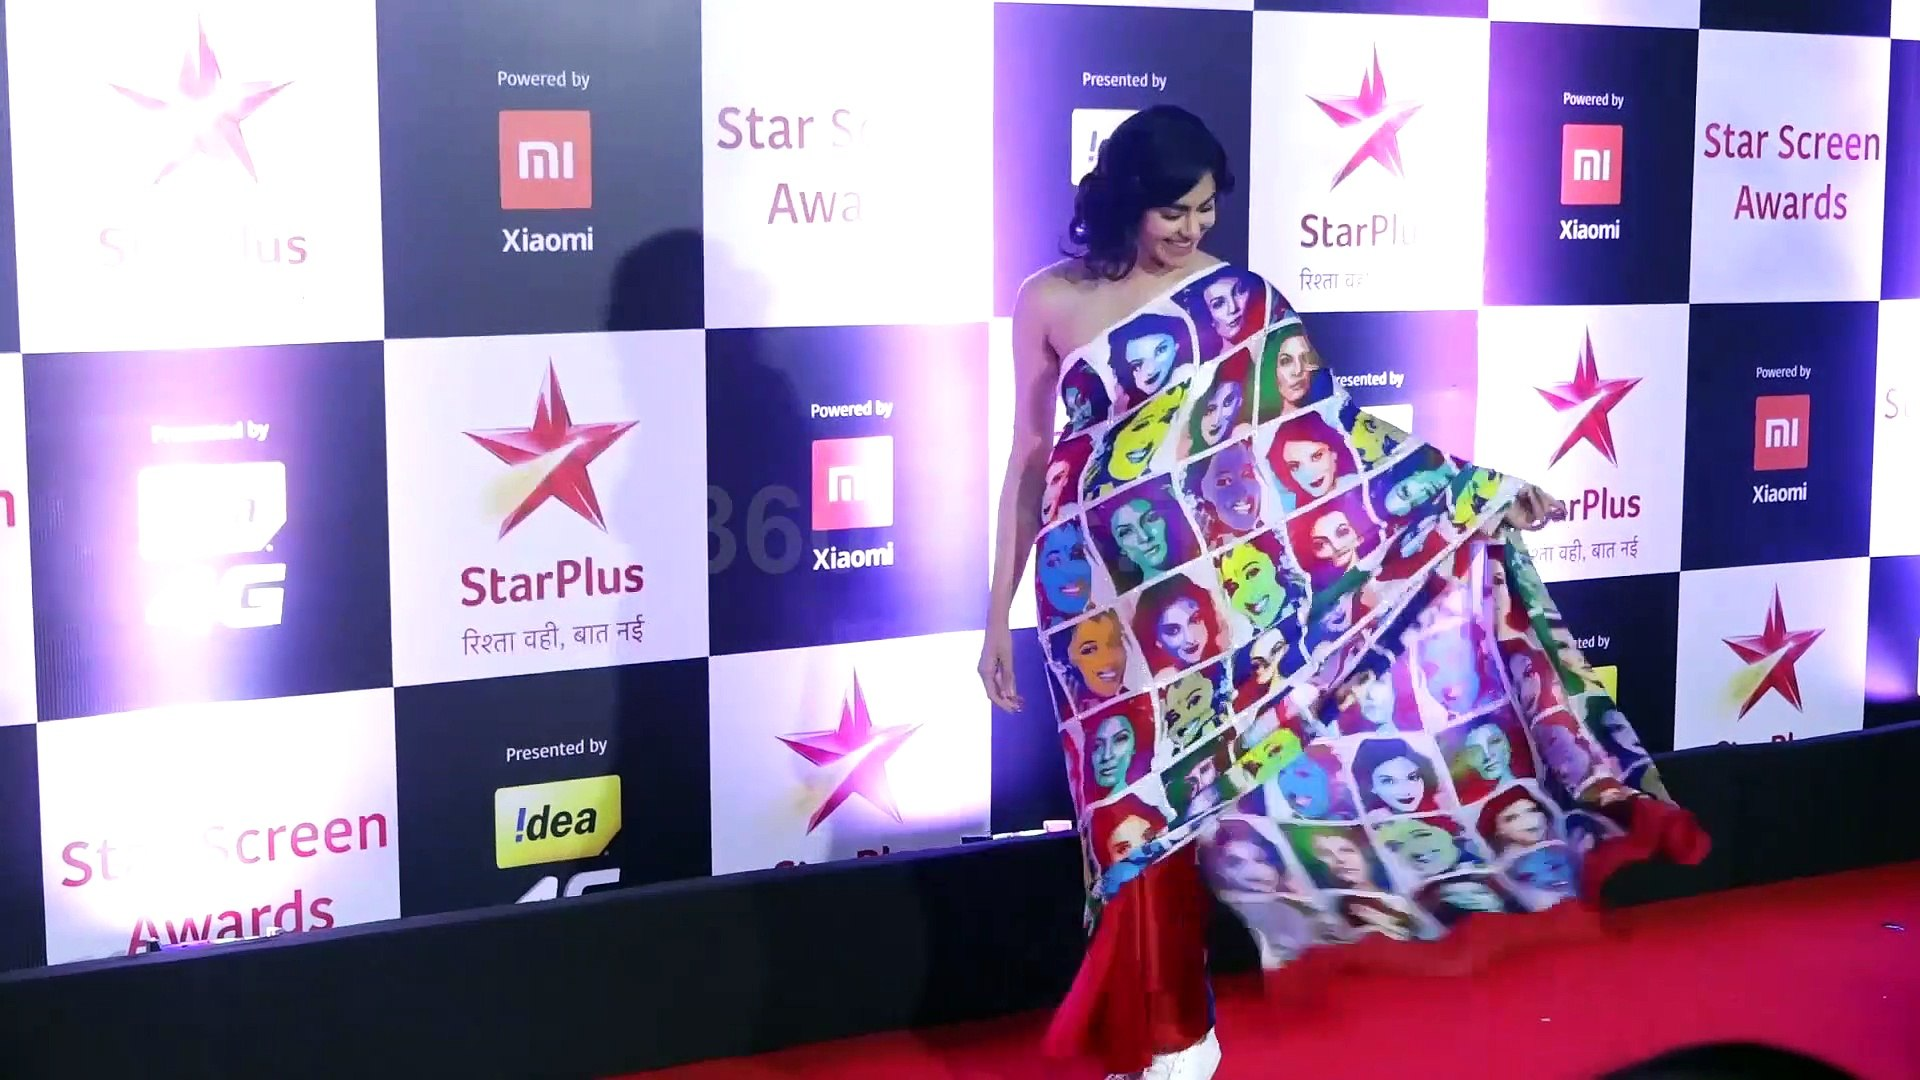 Aayush Sharma, Adah Sharma and Others Attend Star Screen Awards 2018